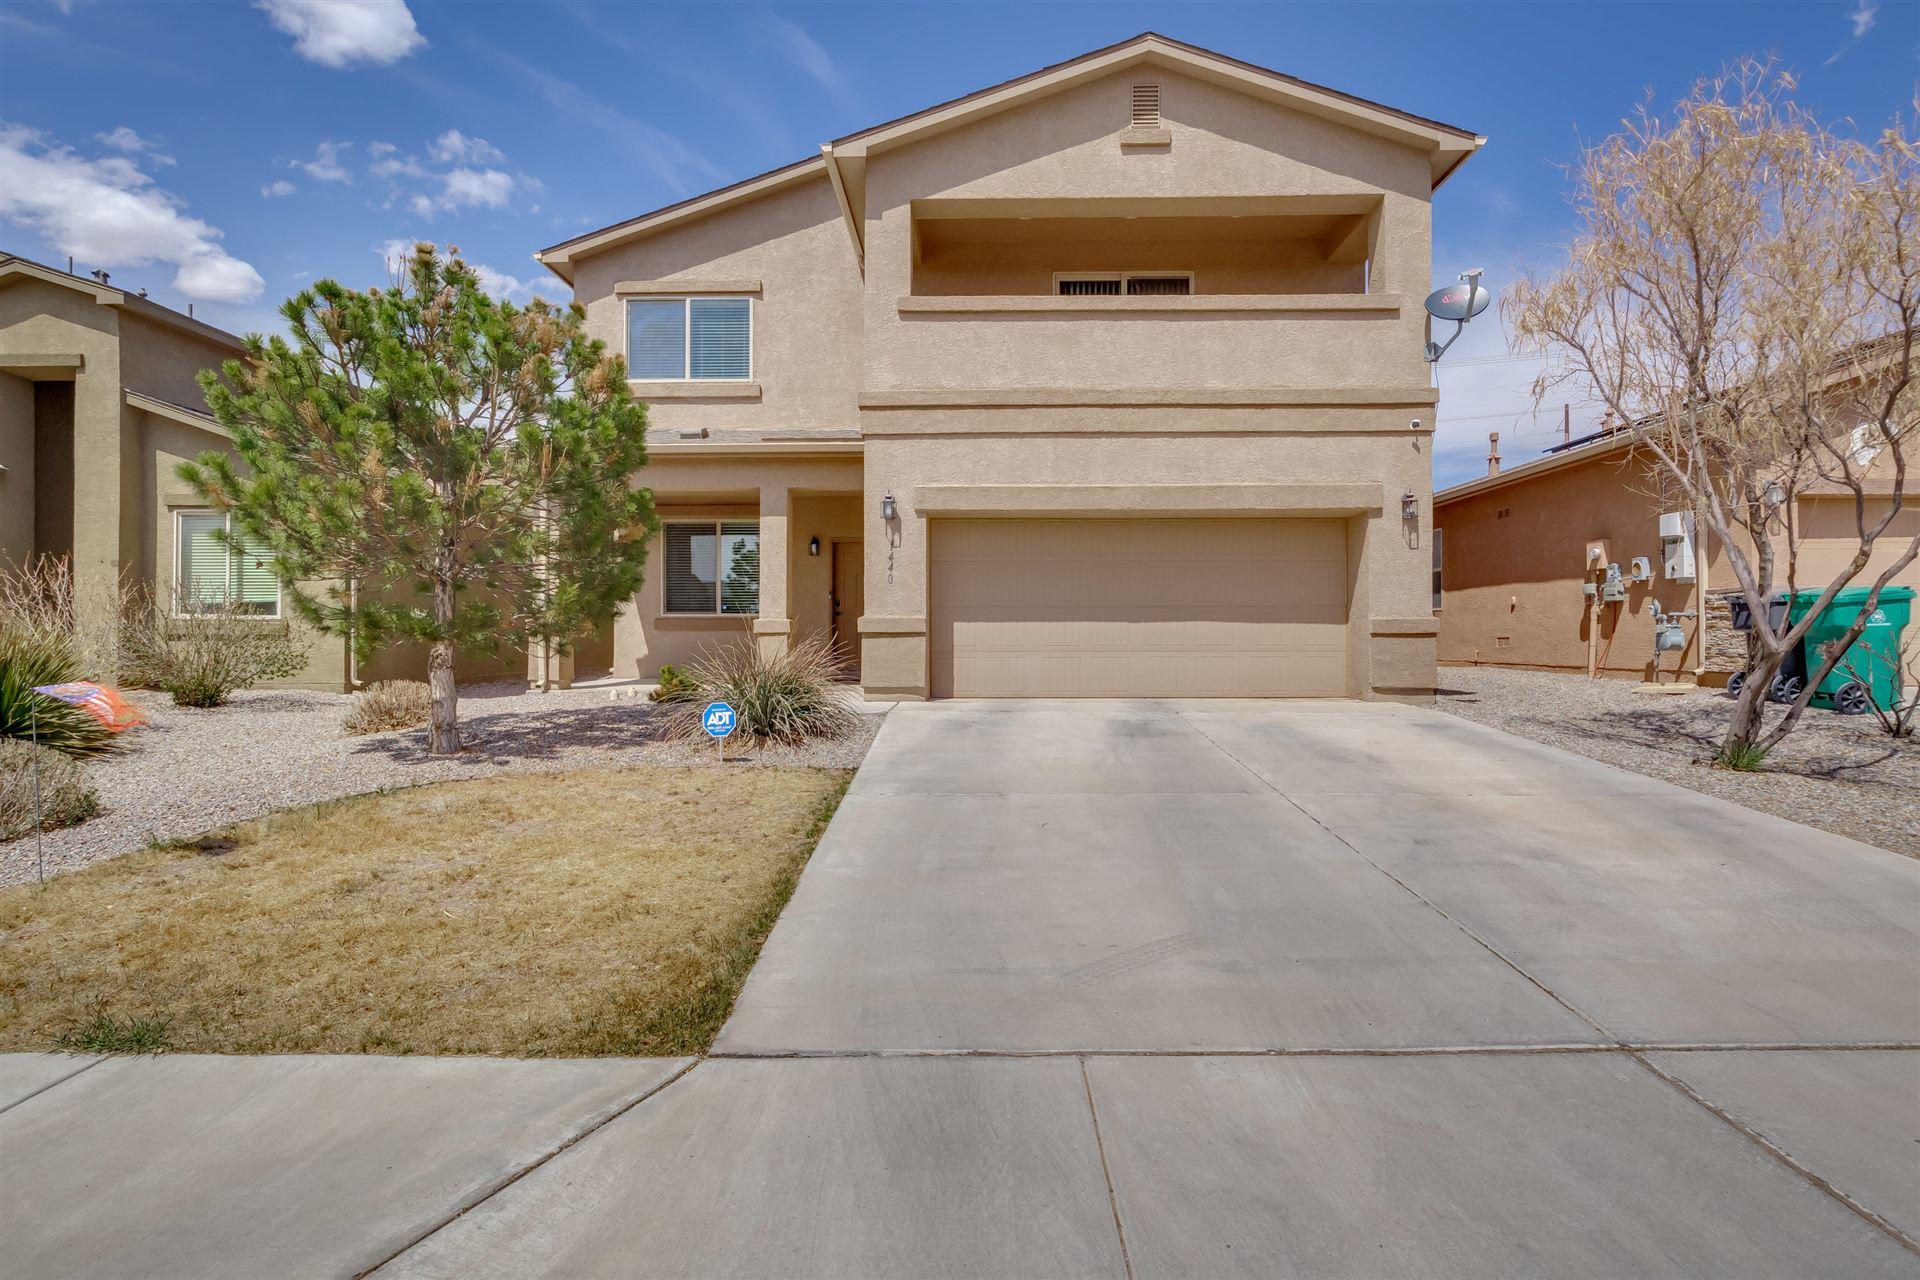 1440 DESERT PAINTBRUSH Loop NE, Rio Rancho, NM 87144 - MLS#: 989320